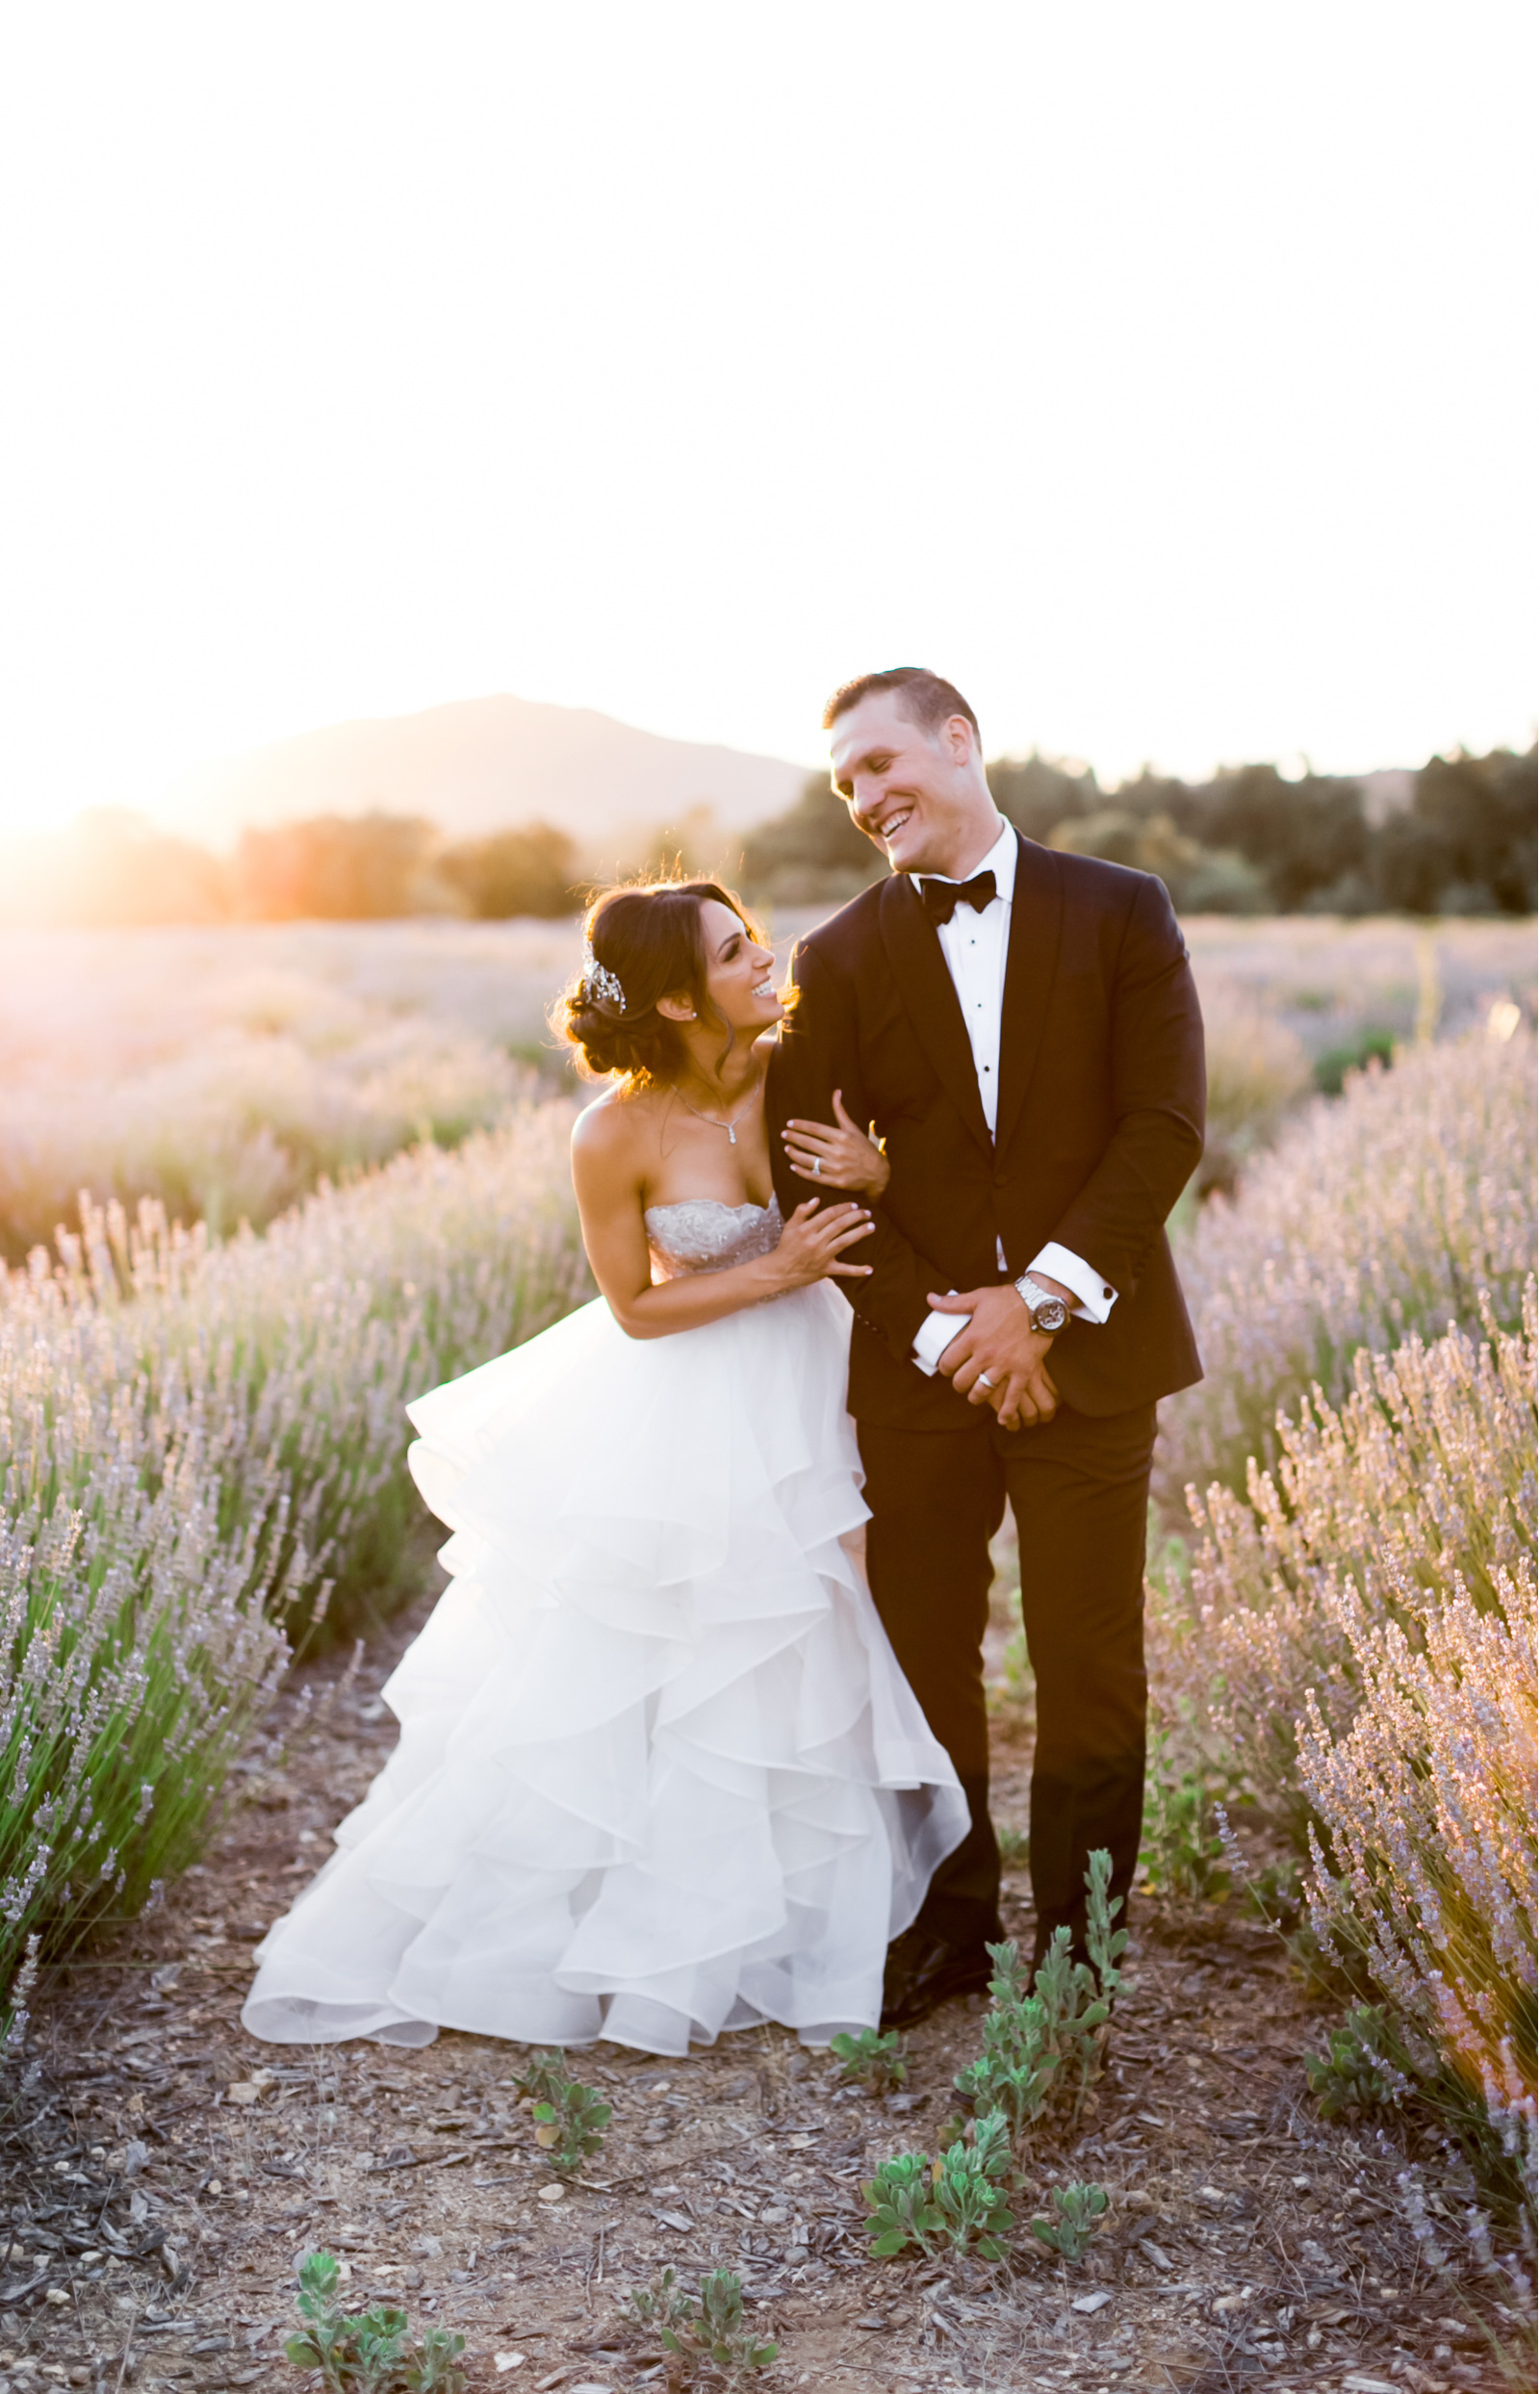 California-Lavender-Field-Wedding-Natalie-Schutt-Photography-Style-Me-Pretty_19.jpg